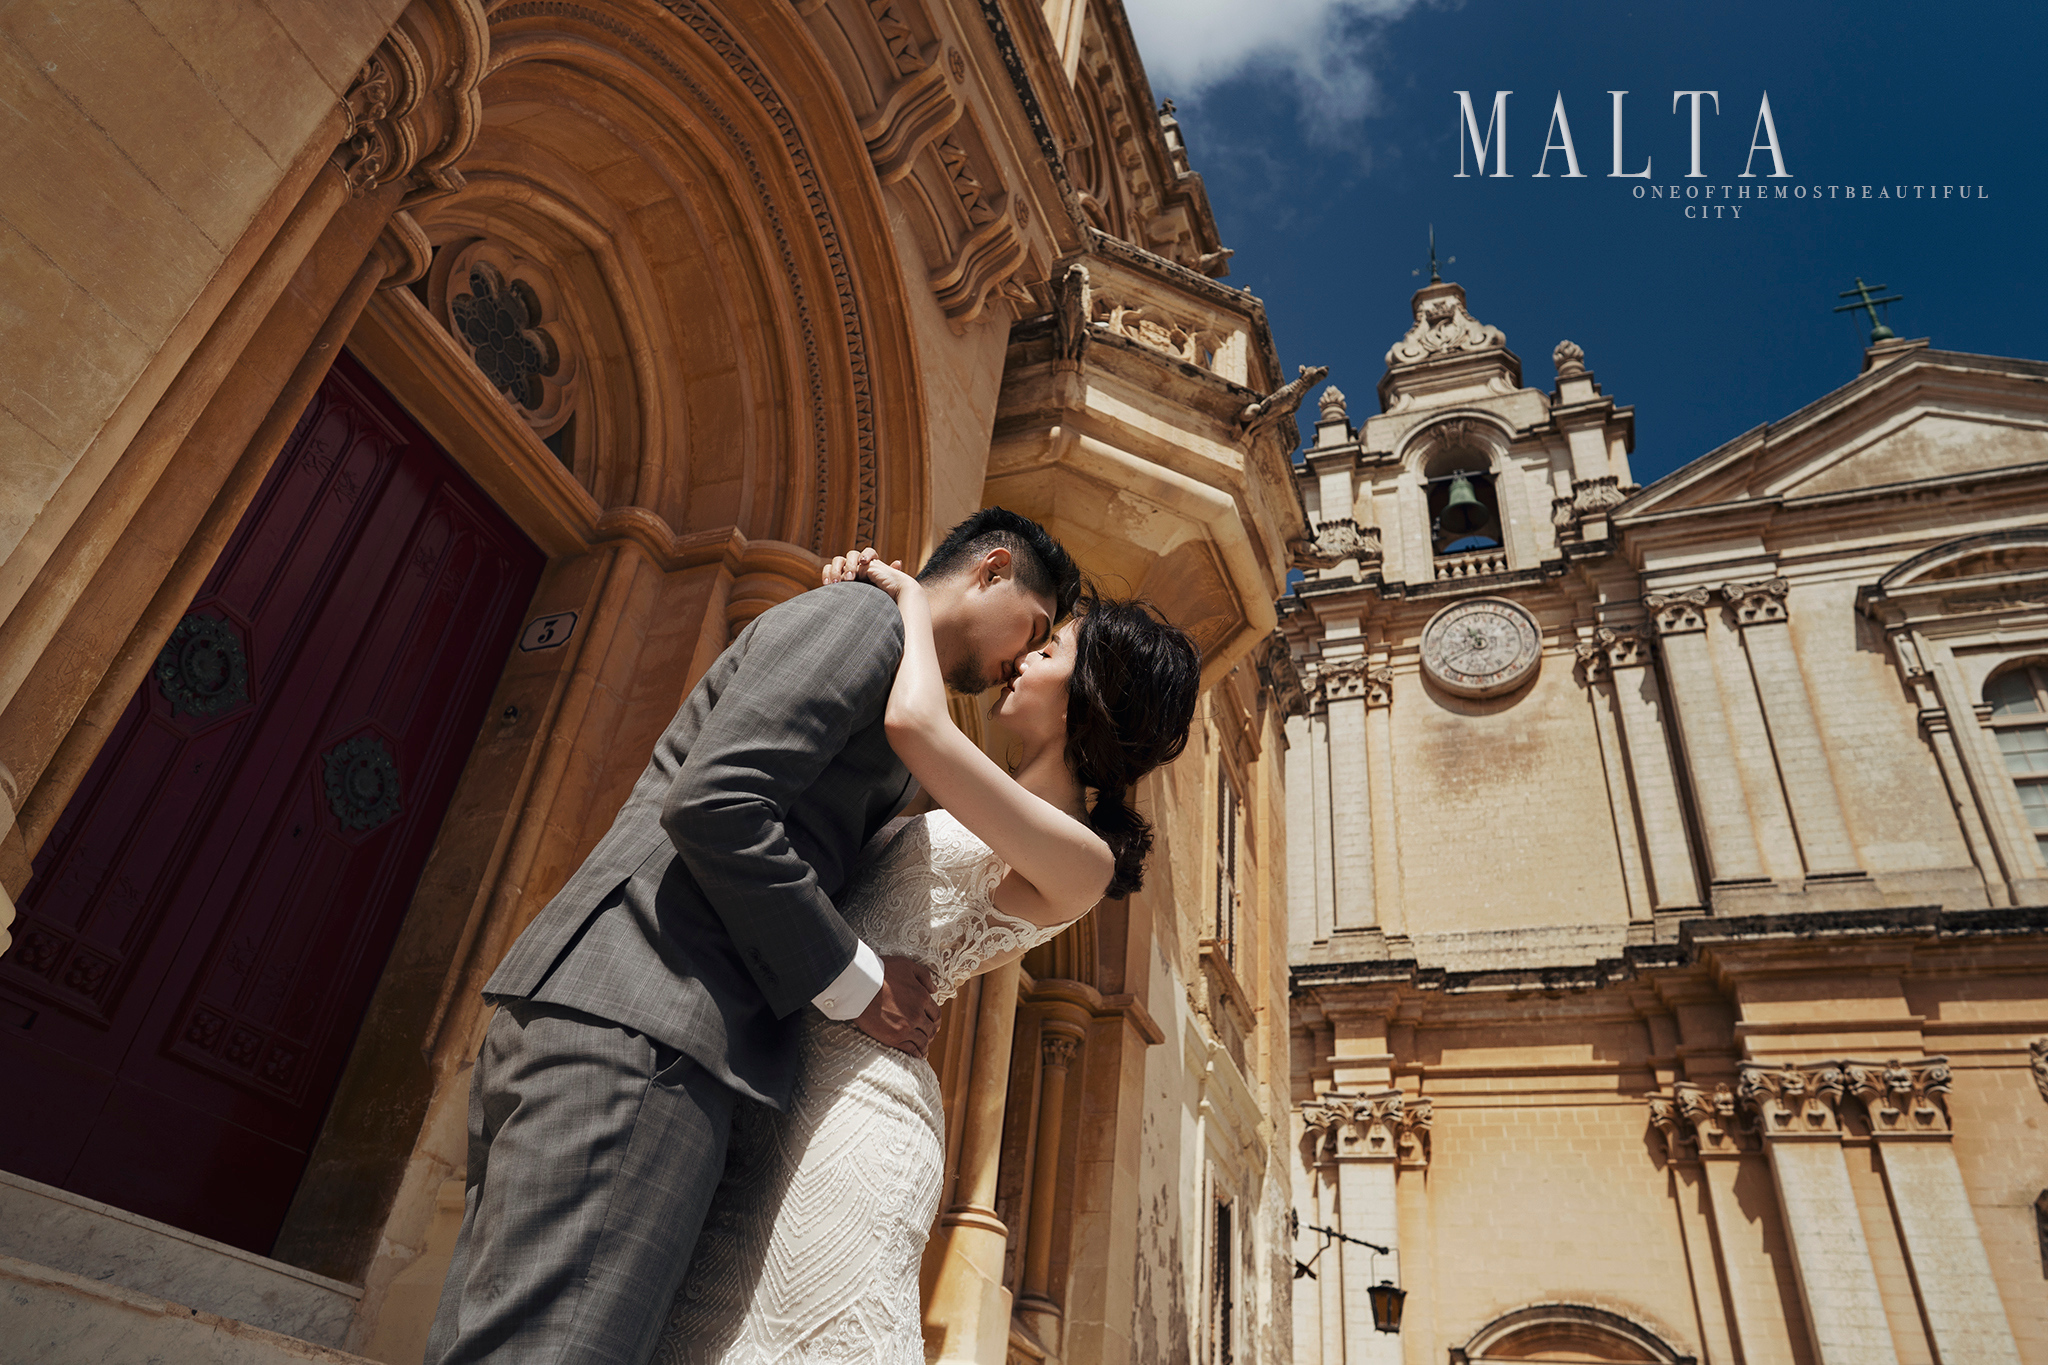 Donfer, 海外婚紗, World tour, 東法, EASTERN WEDDING, 世界旅拍, Malta, 馬爾他, 馬爾他婚紗